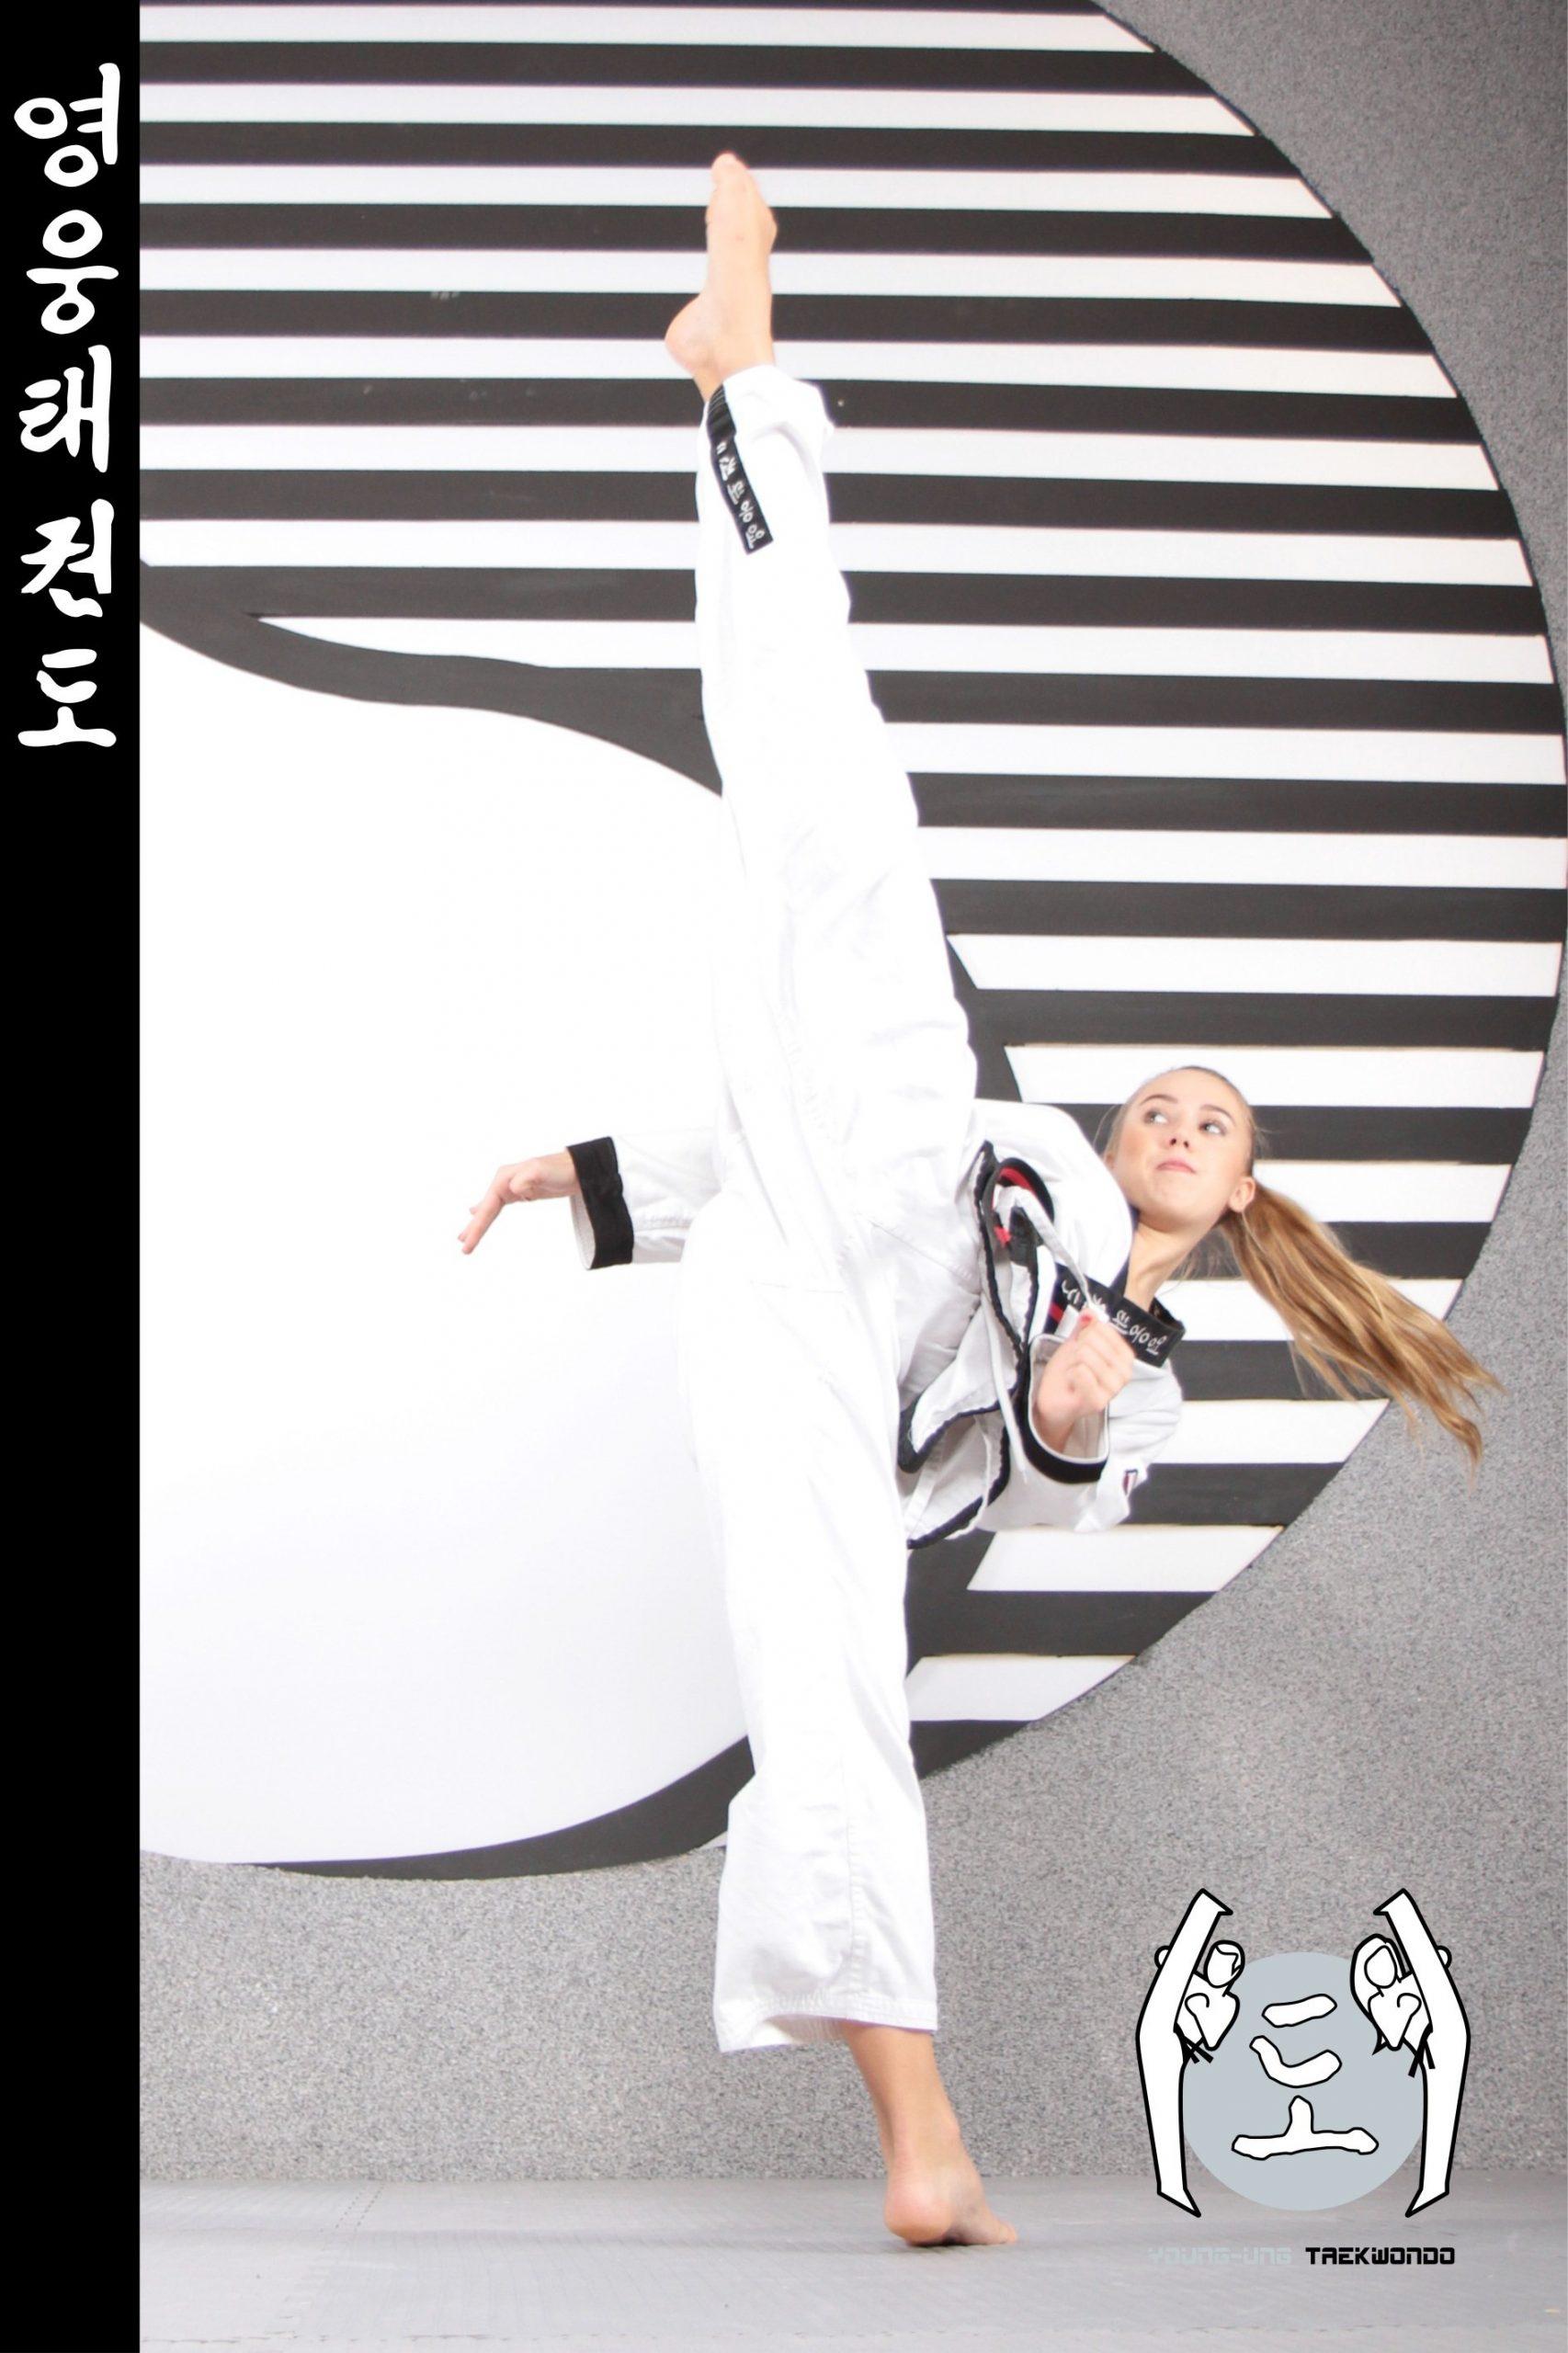 Taekwondo-Trainerin in Taekwondo Kick Pose aus Zweigstelle 3400 Klosterneuburg